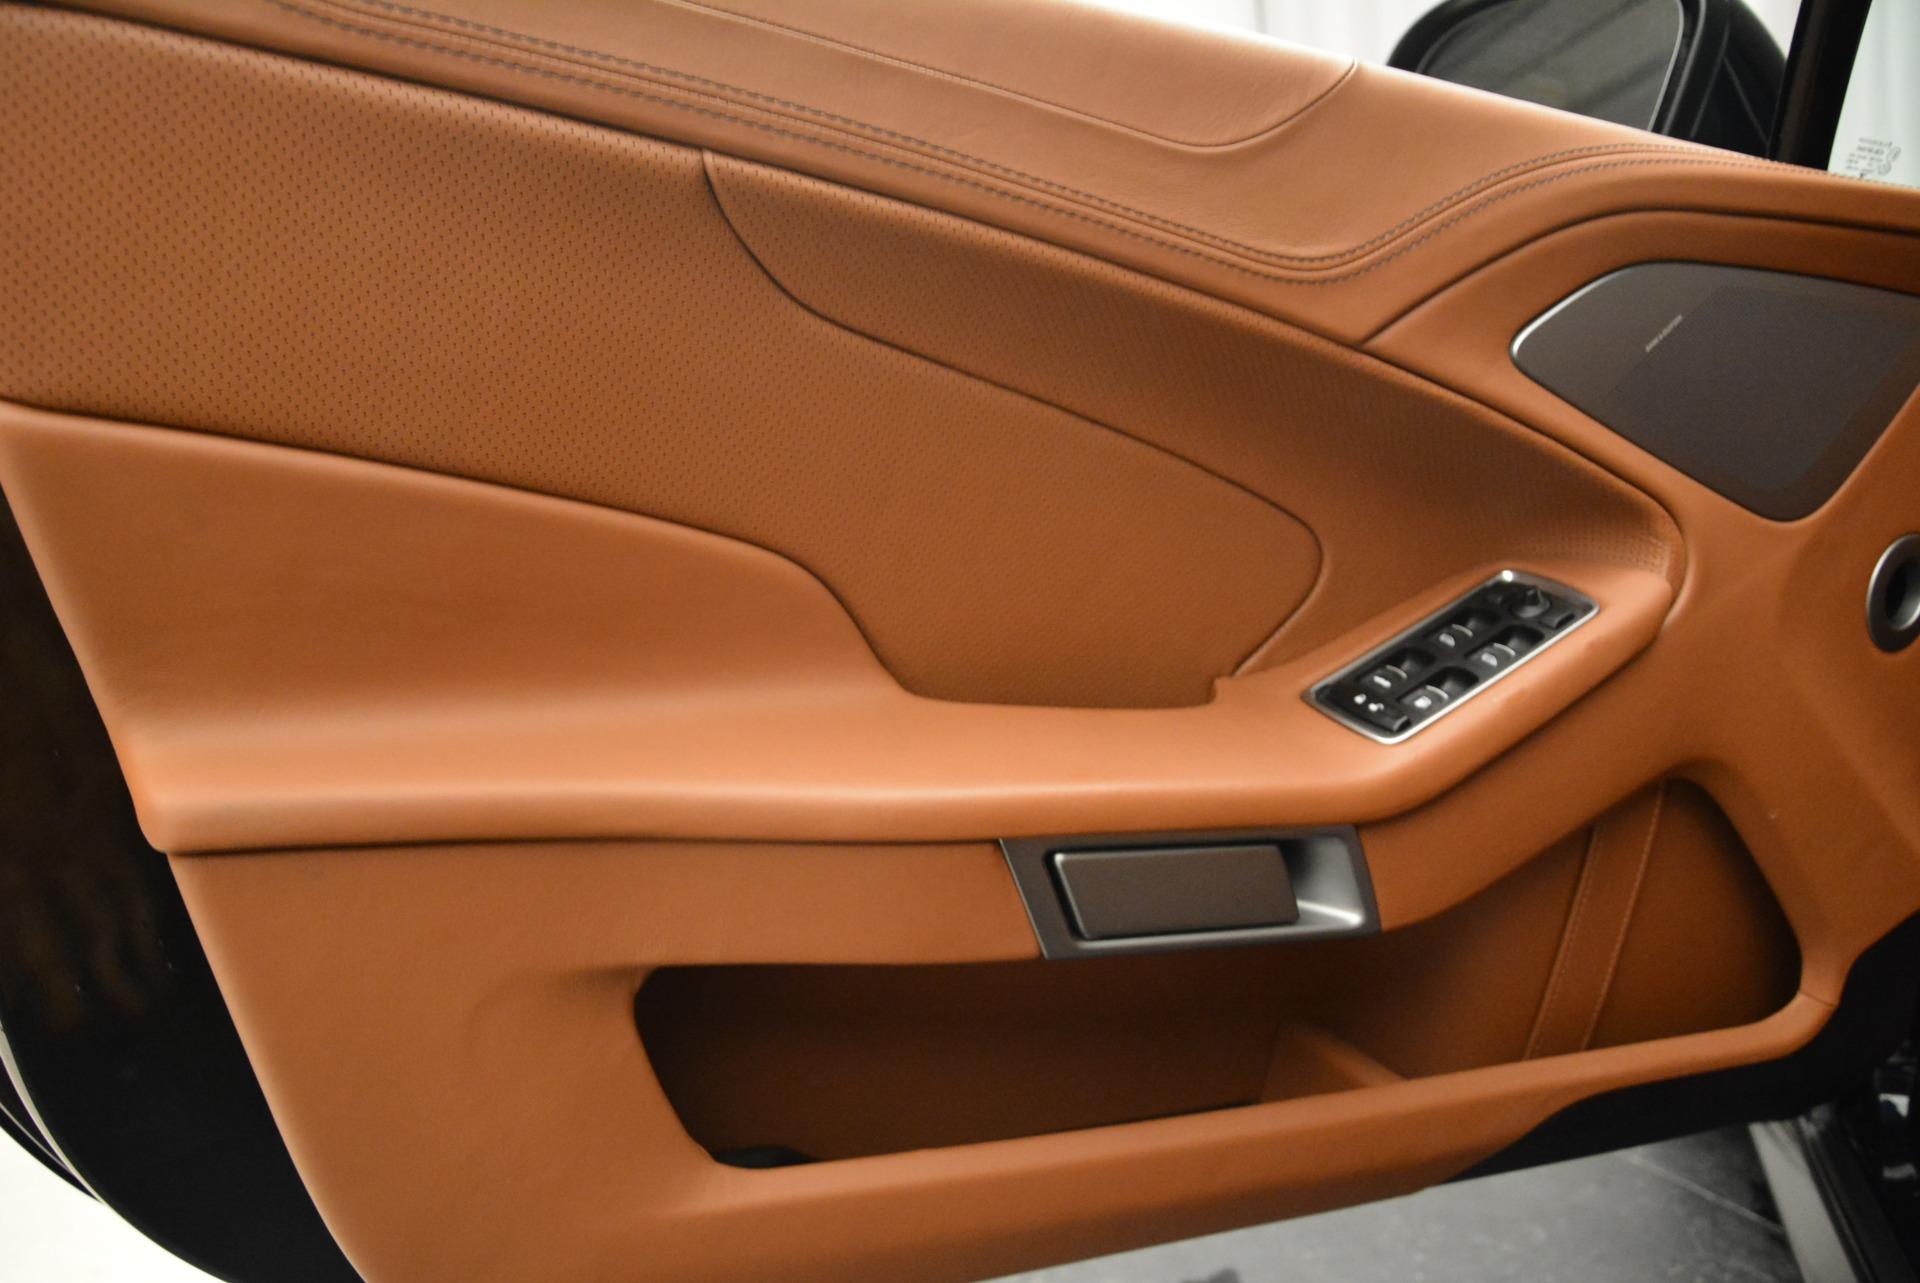 Used 2014 Aston Martin Vanquish Volante For Sale In Greenwich, CT 2097_p25